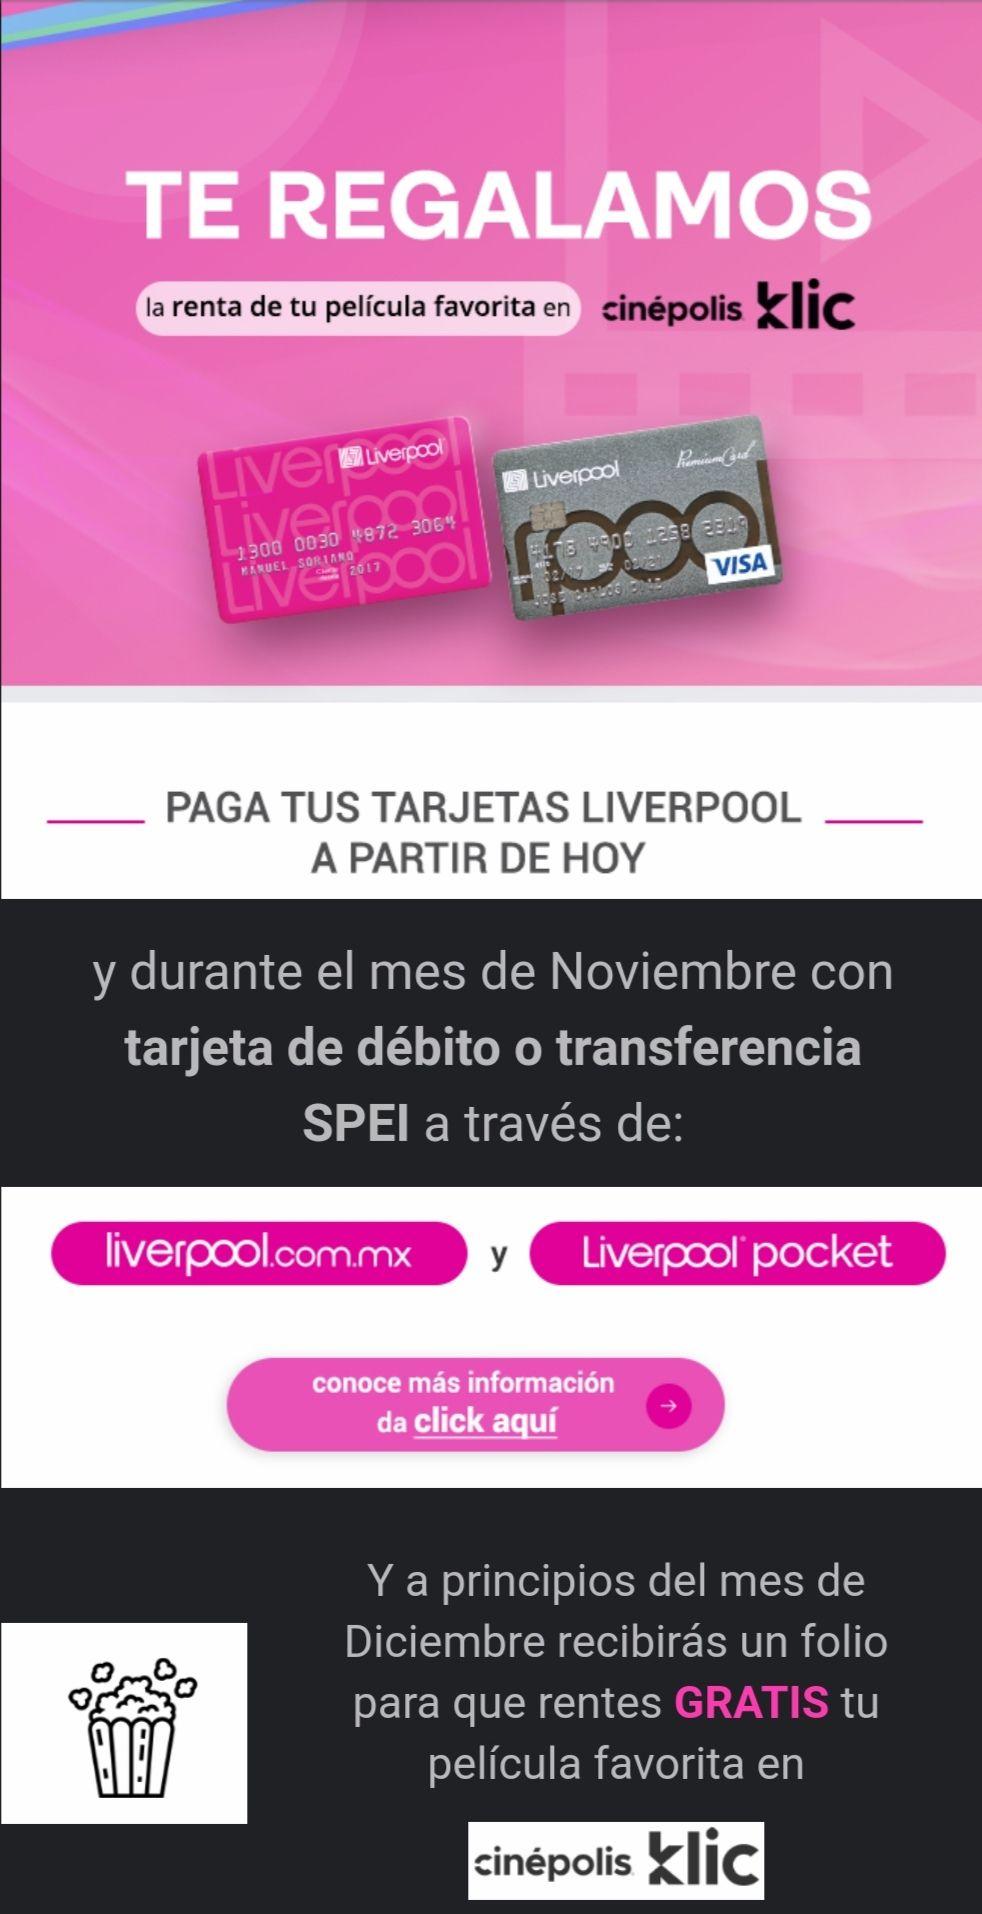 Liverpool: Renta cinepolis klic gratis!